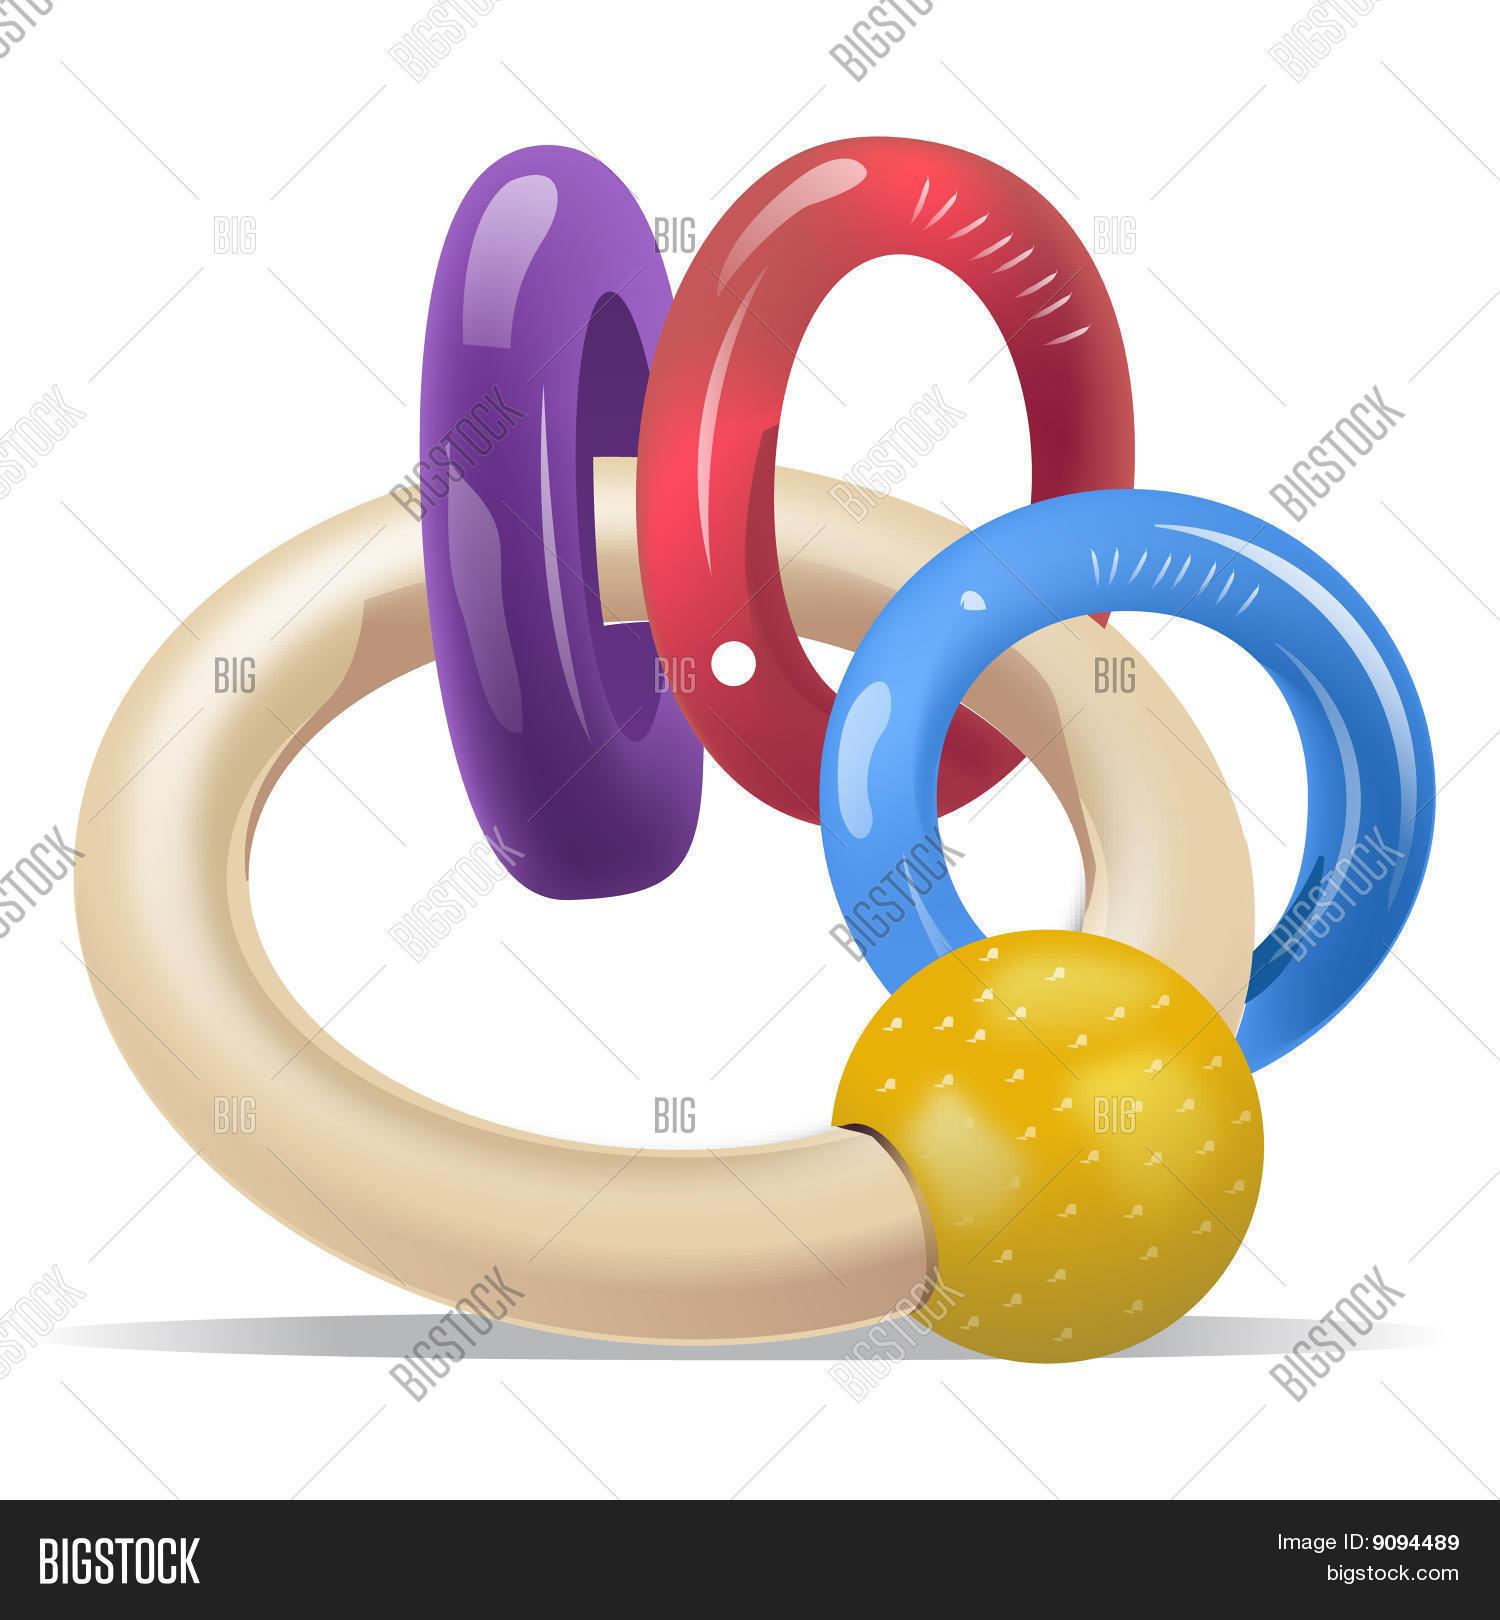 Baby Teething Ring Stock Vector & Stock Photos.